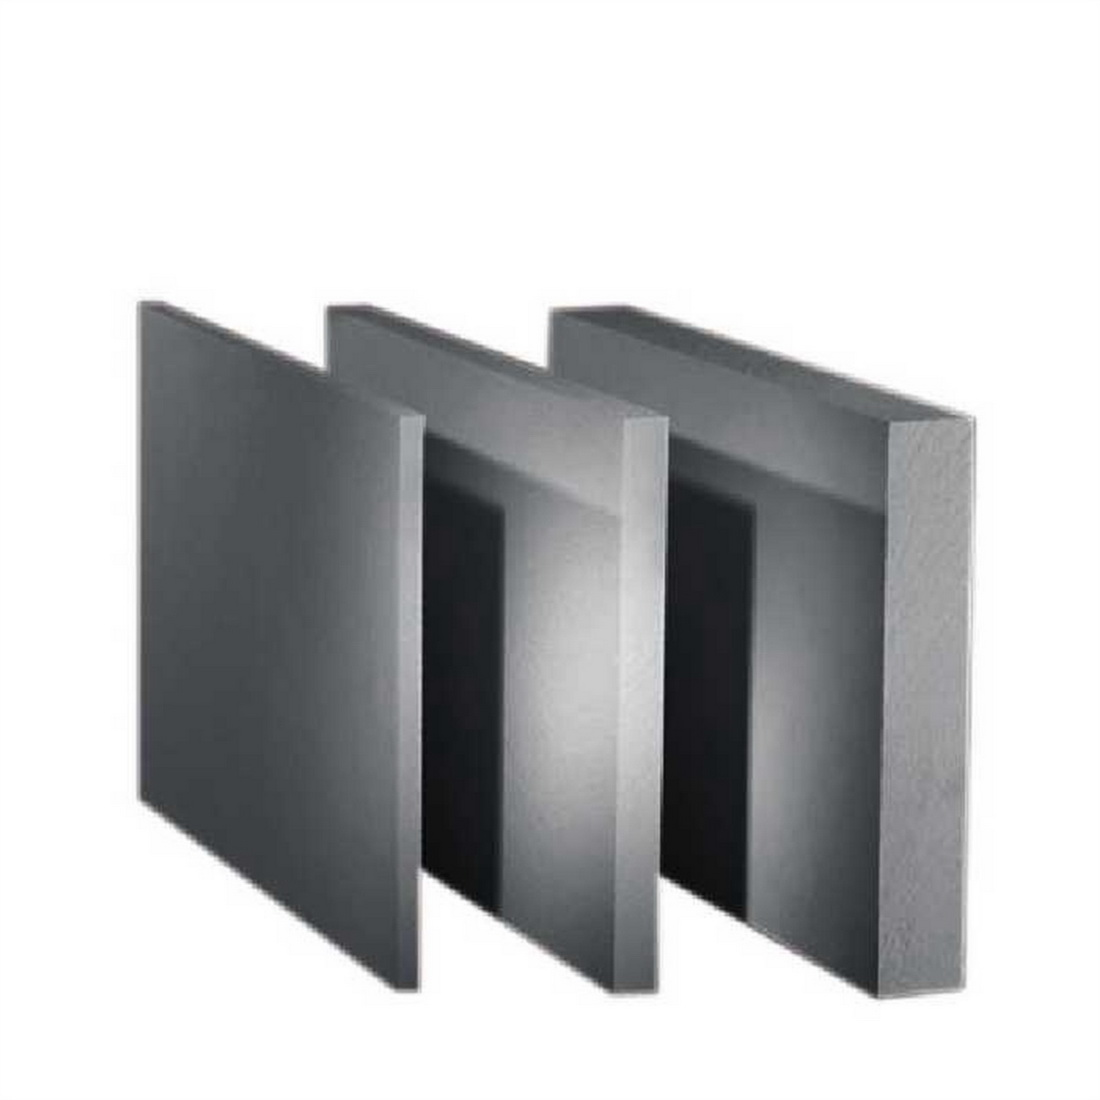 Expol Platinum Board 2400 x 1200 x 60mm R1.88 Black Expanded Polystyrene N2460